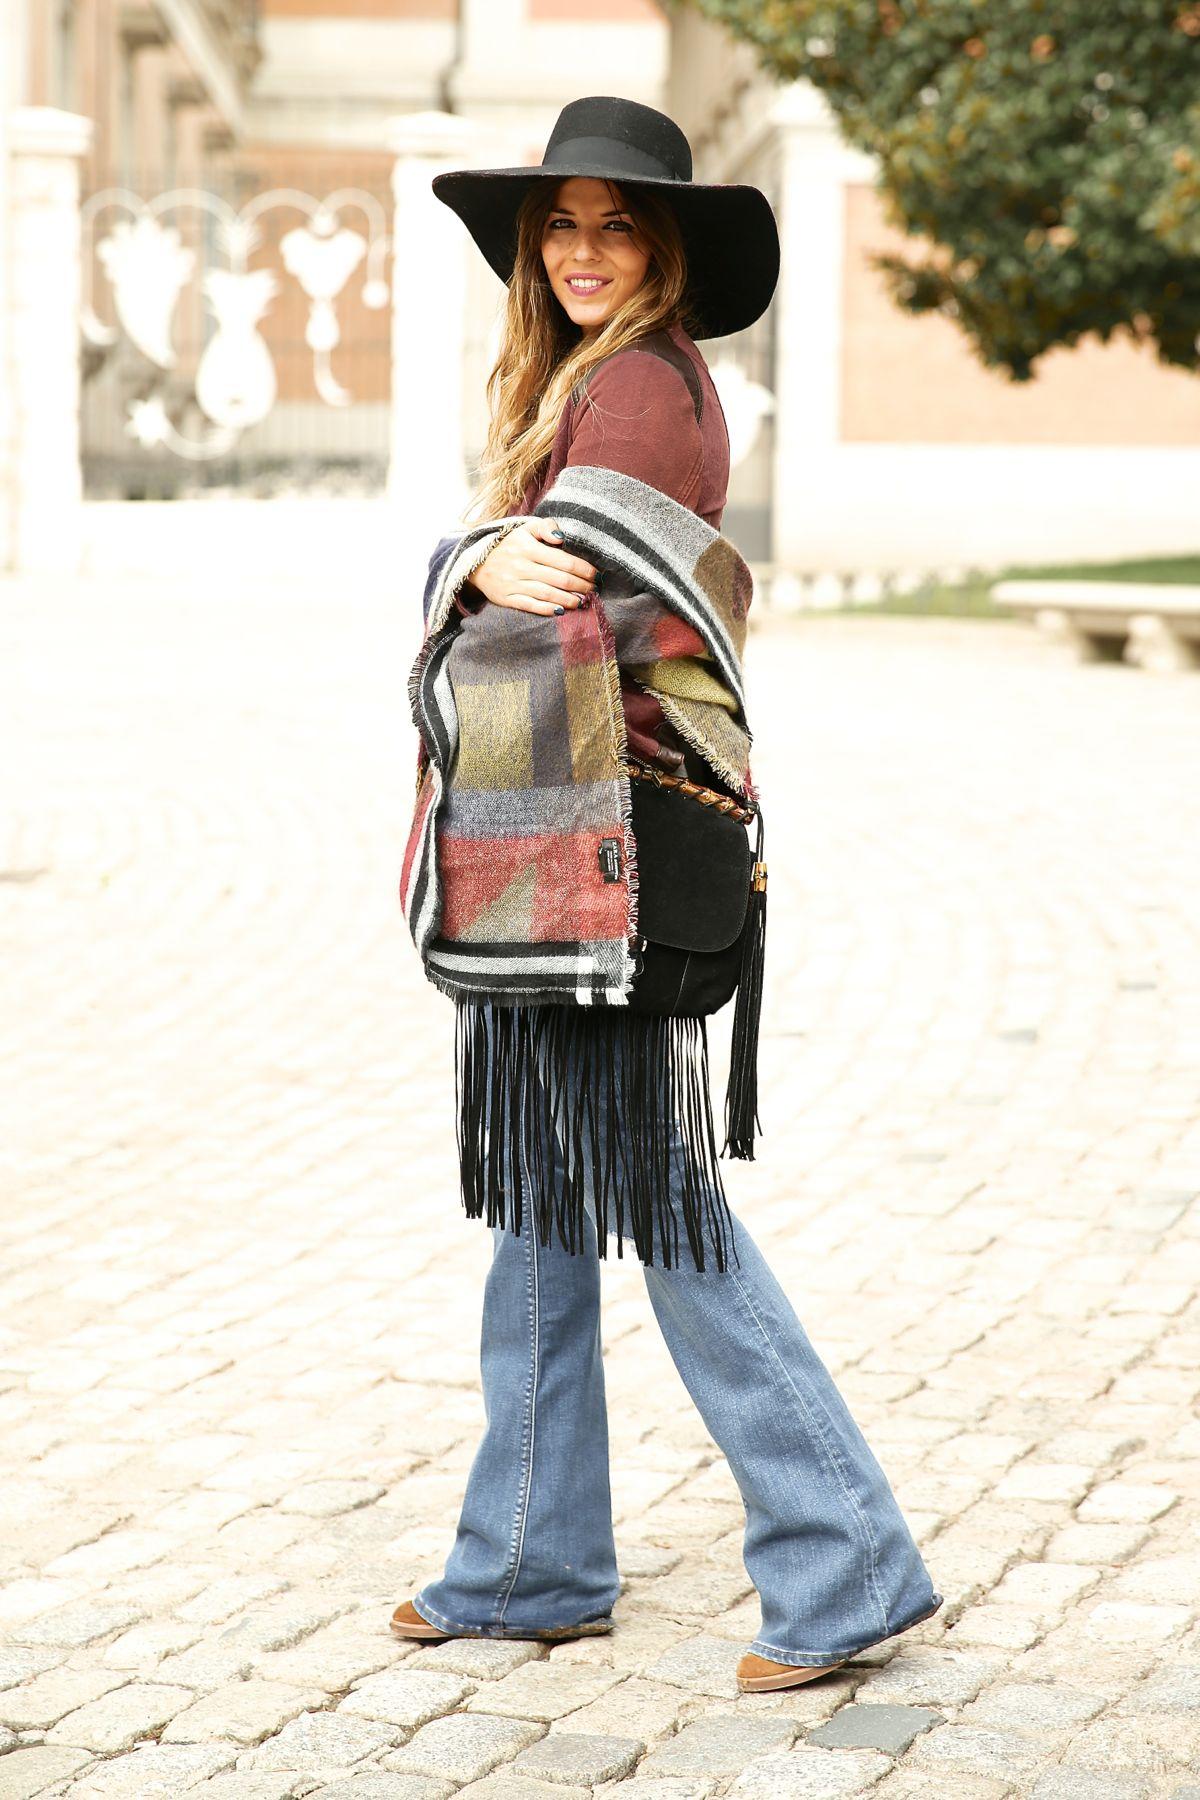 trendy_taste-look-outfit-street_style-ootd-blog-blogger-fashion_spain-moda_españa-AD-adolfo_dominguez-amaia_salamanca-boho-hippie-sombrero-hat-biker-flecos-fringes-10